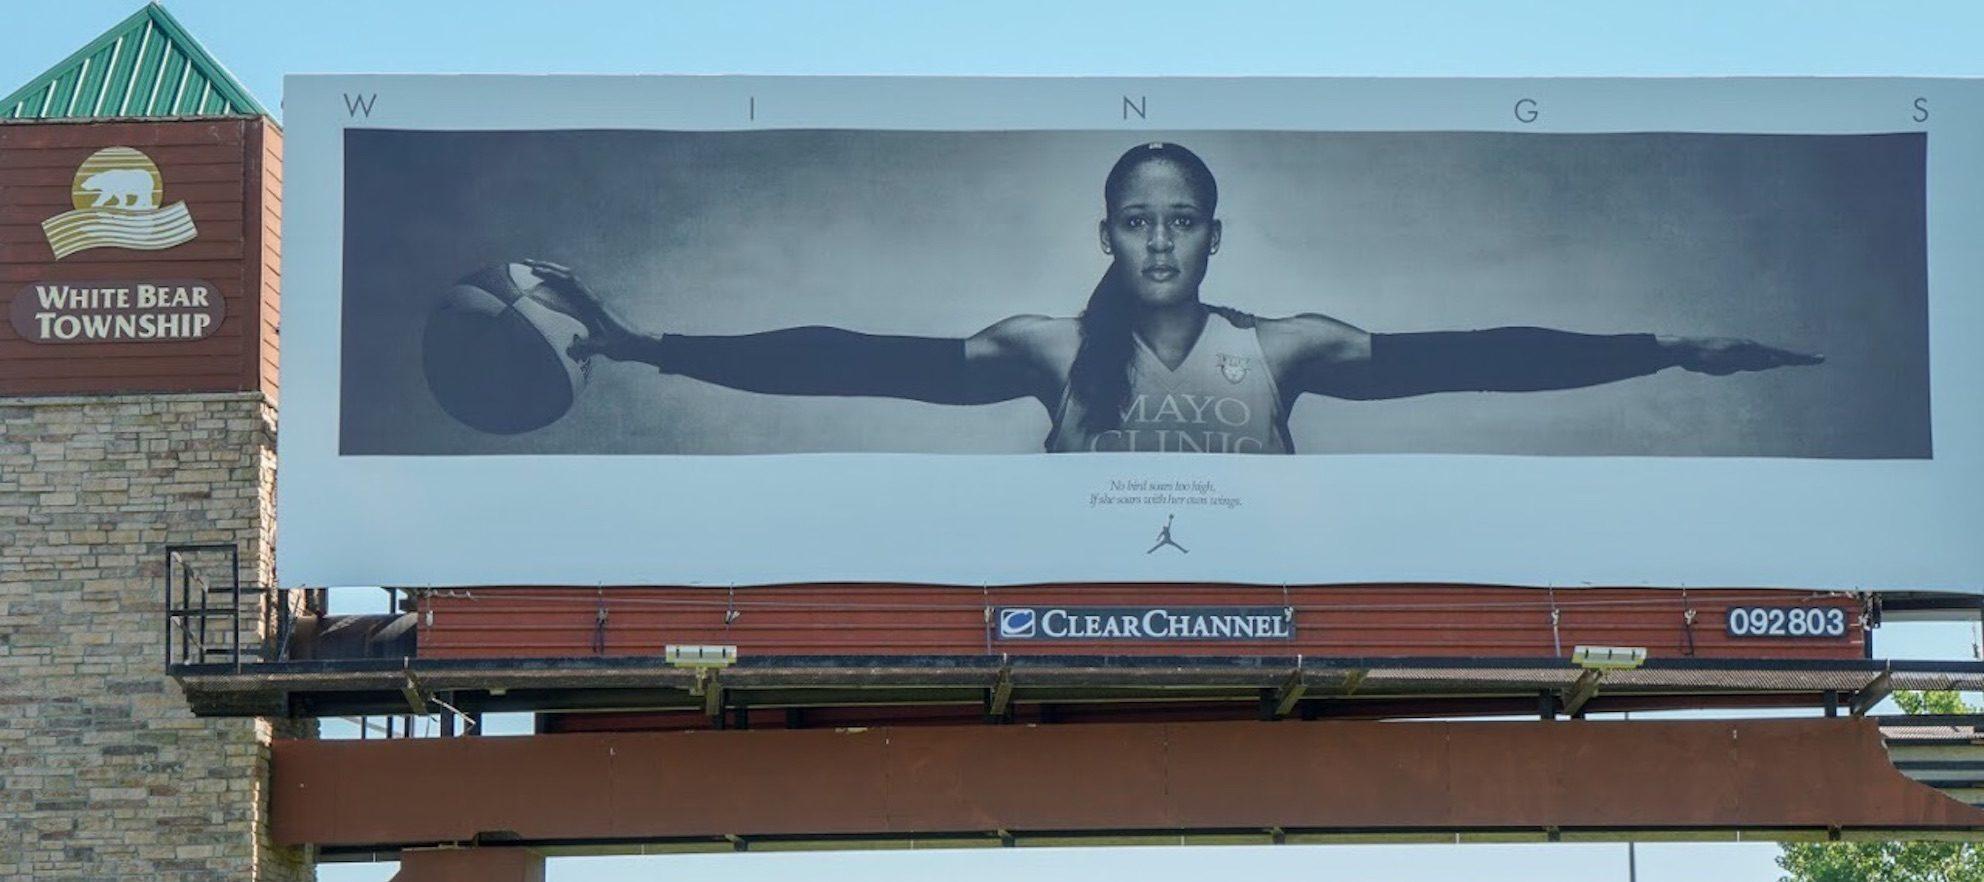 Kris Lindahl's billboards are making headlines again